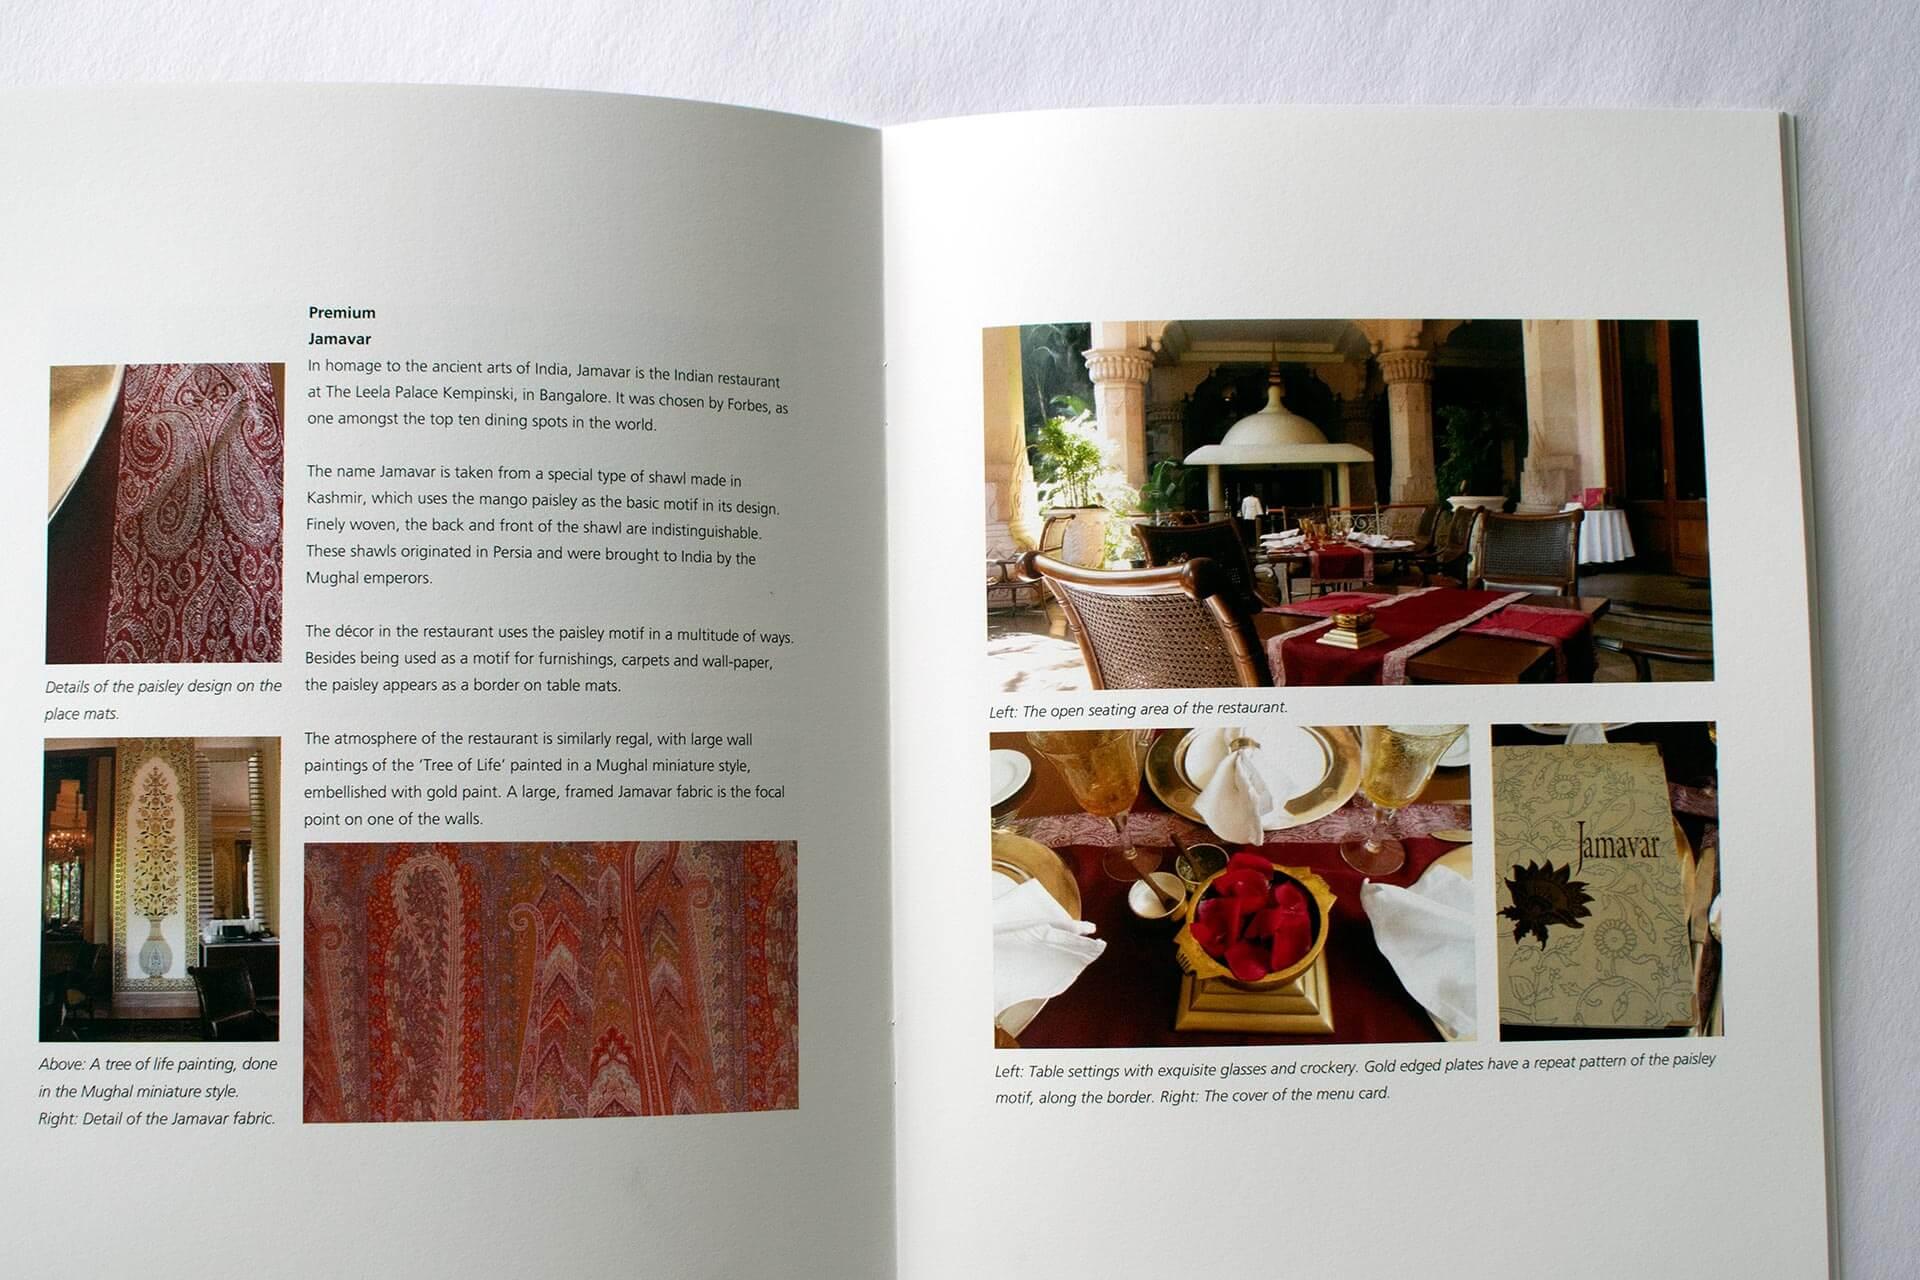 The design vocabulary of 'Jamavar' at the Leela Palace